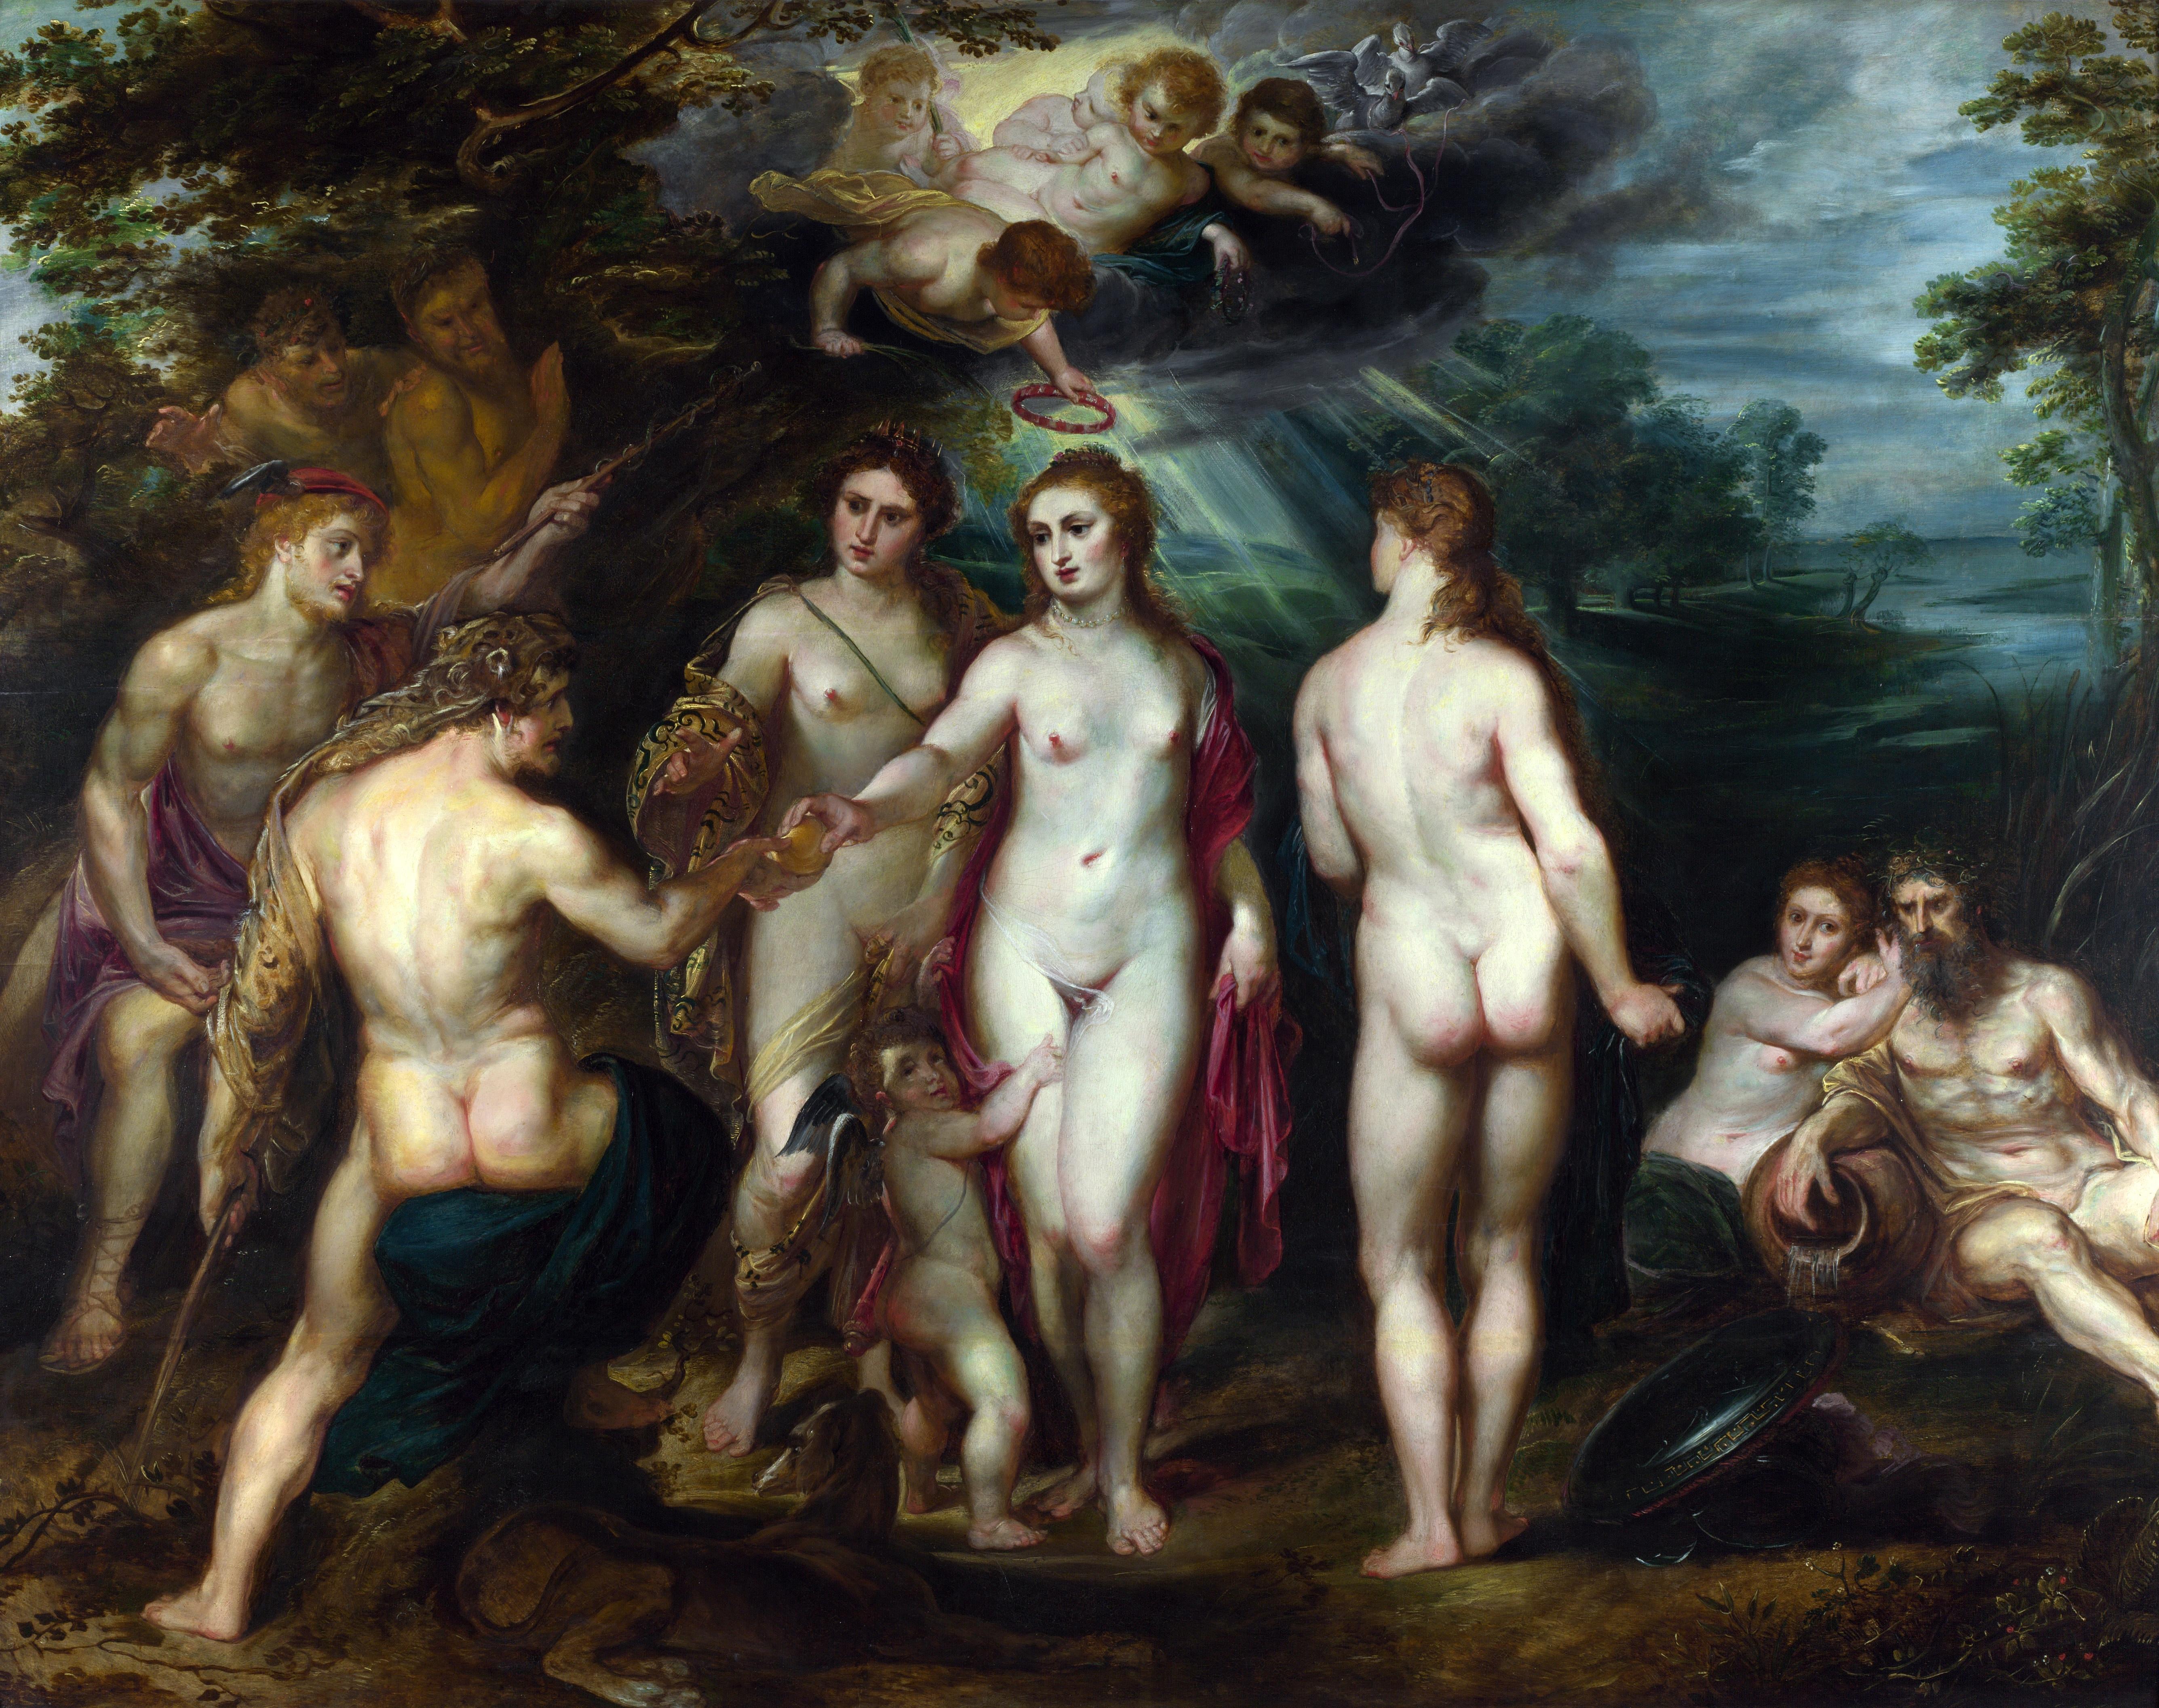 Peter Paul Rubens, 1577-1640. Суд Париса. ок.1625. 133.9 х 68.7 см. Лондон, Национальная галерея